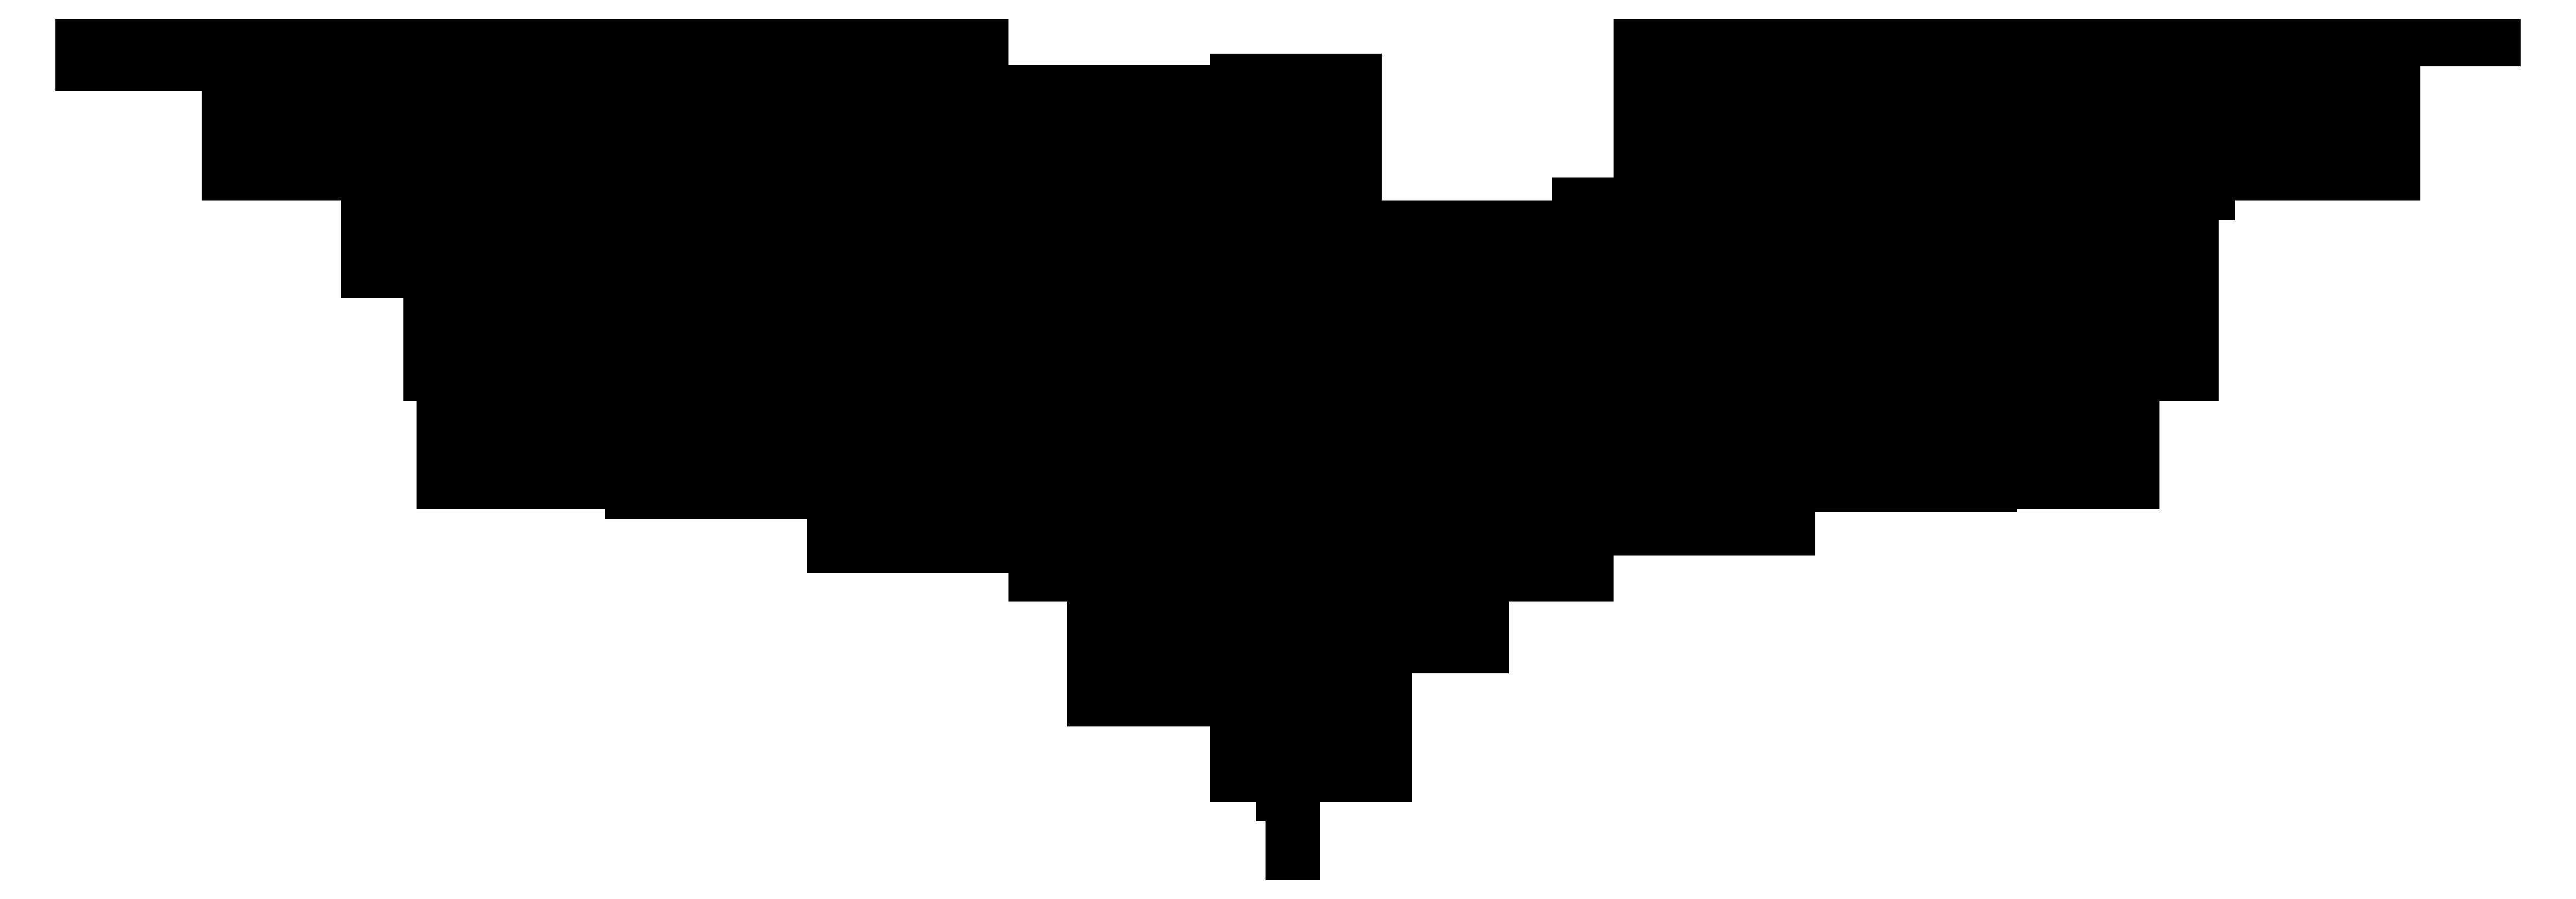 Batman clipart batman silhouette. Logo various comics png